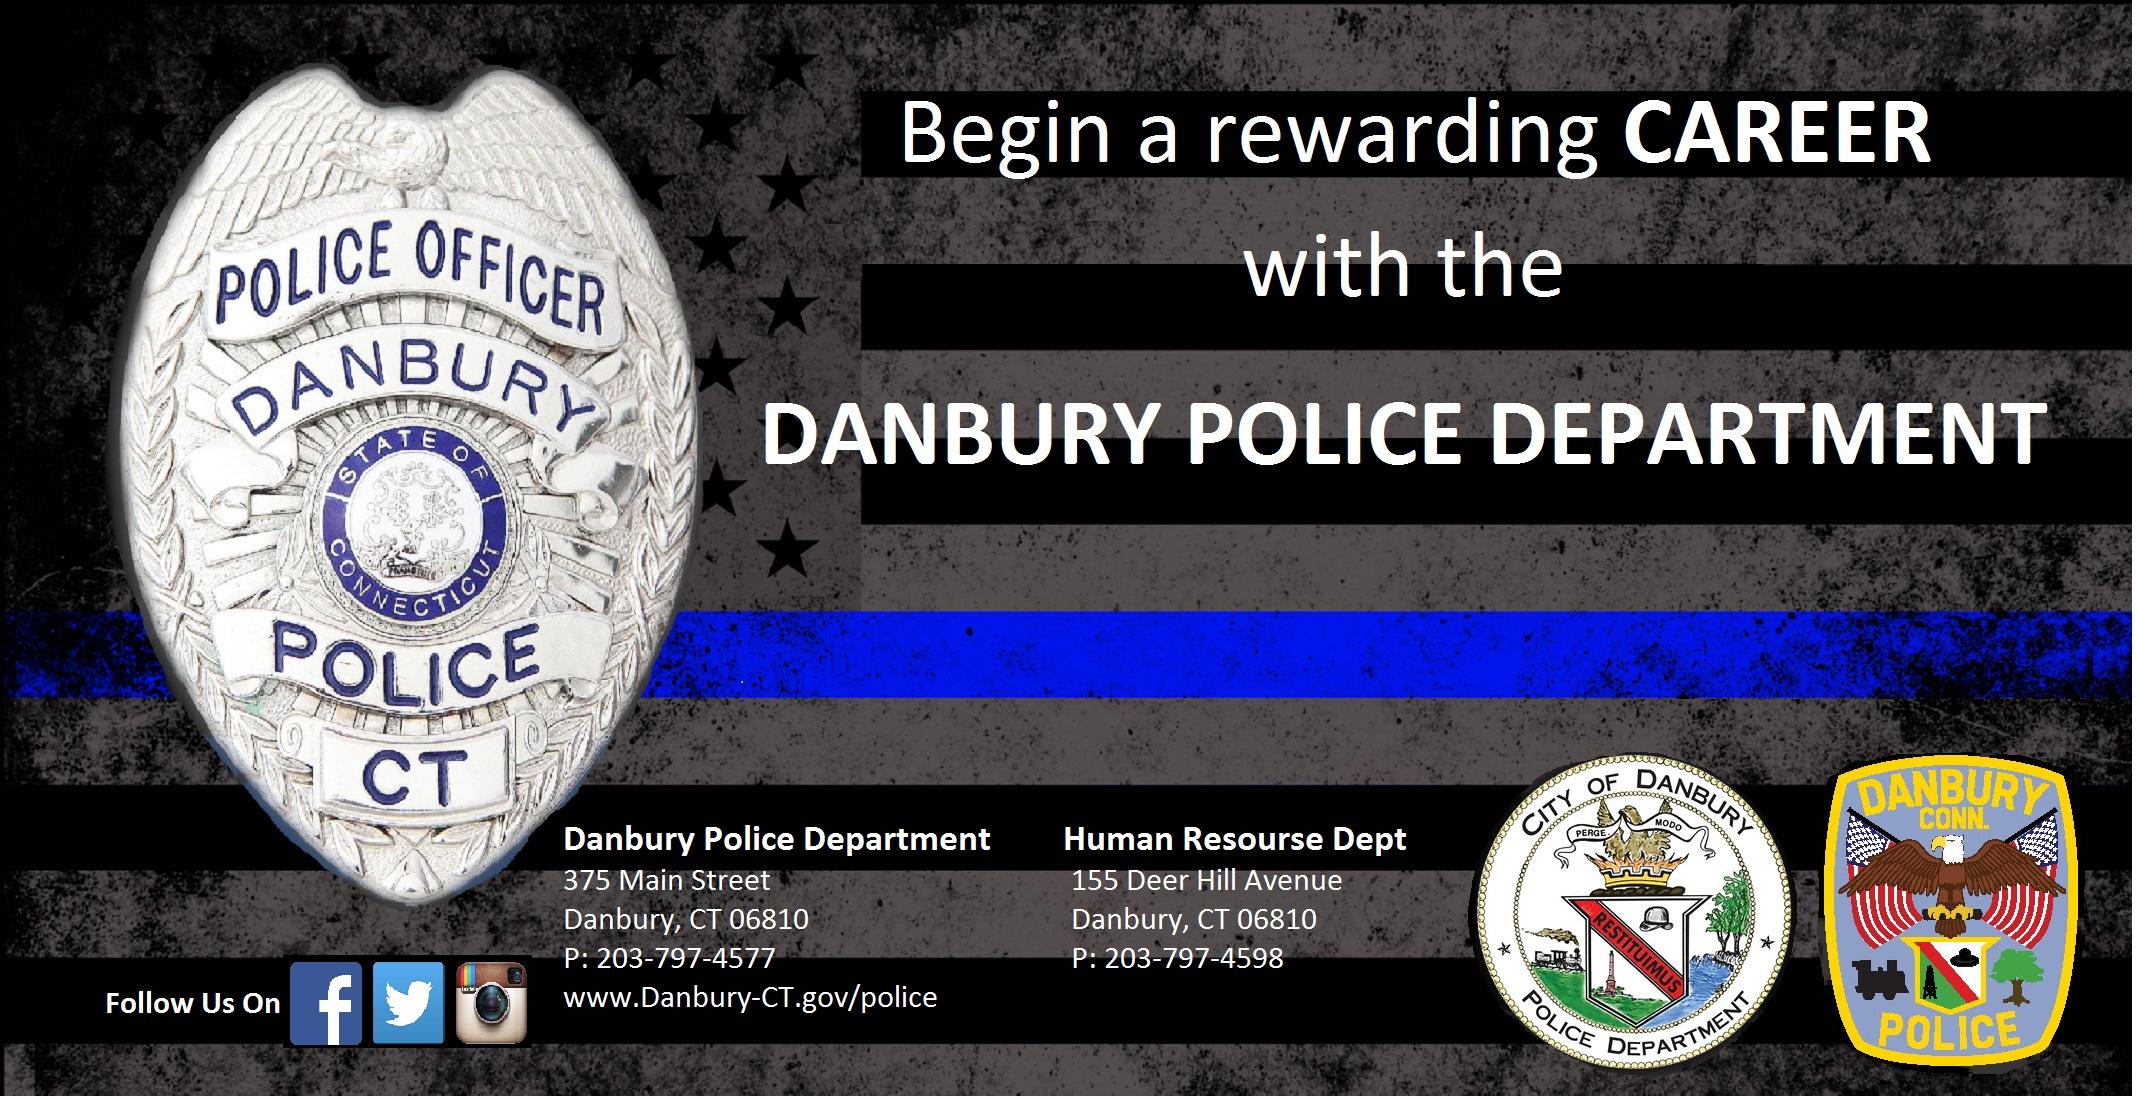 Danbury Recruitment Team, CT Police Jobs - Entry Level